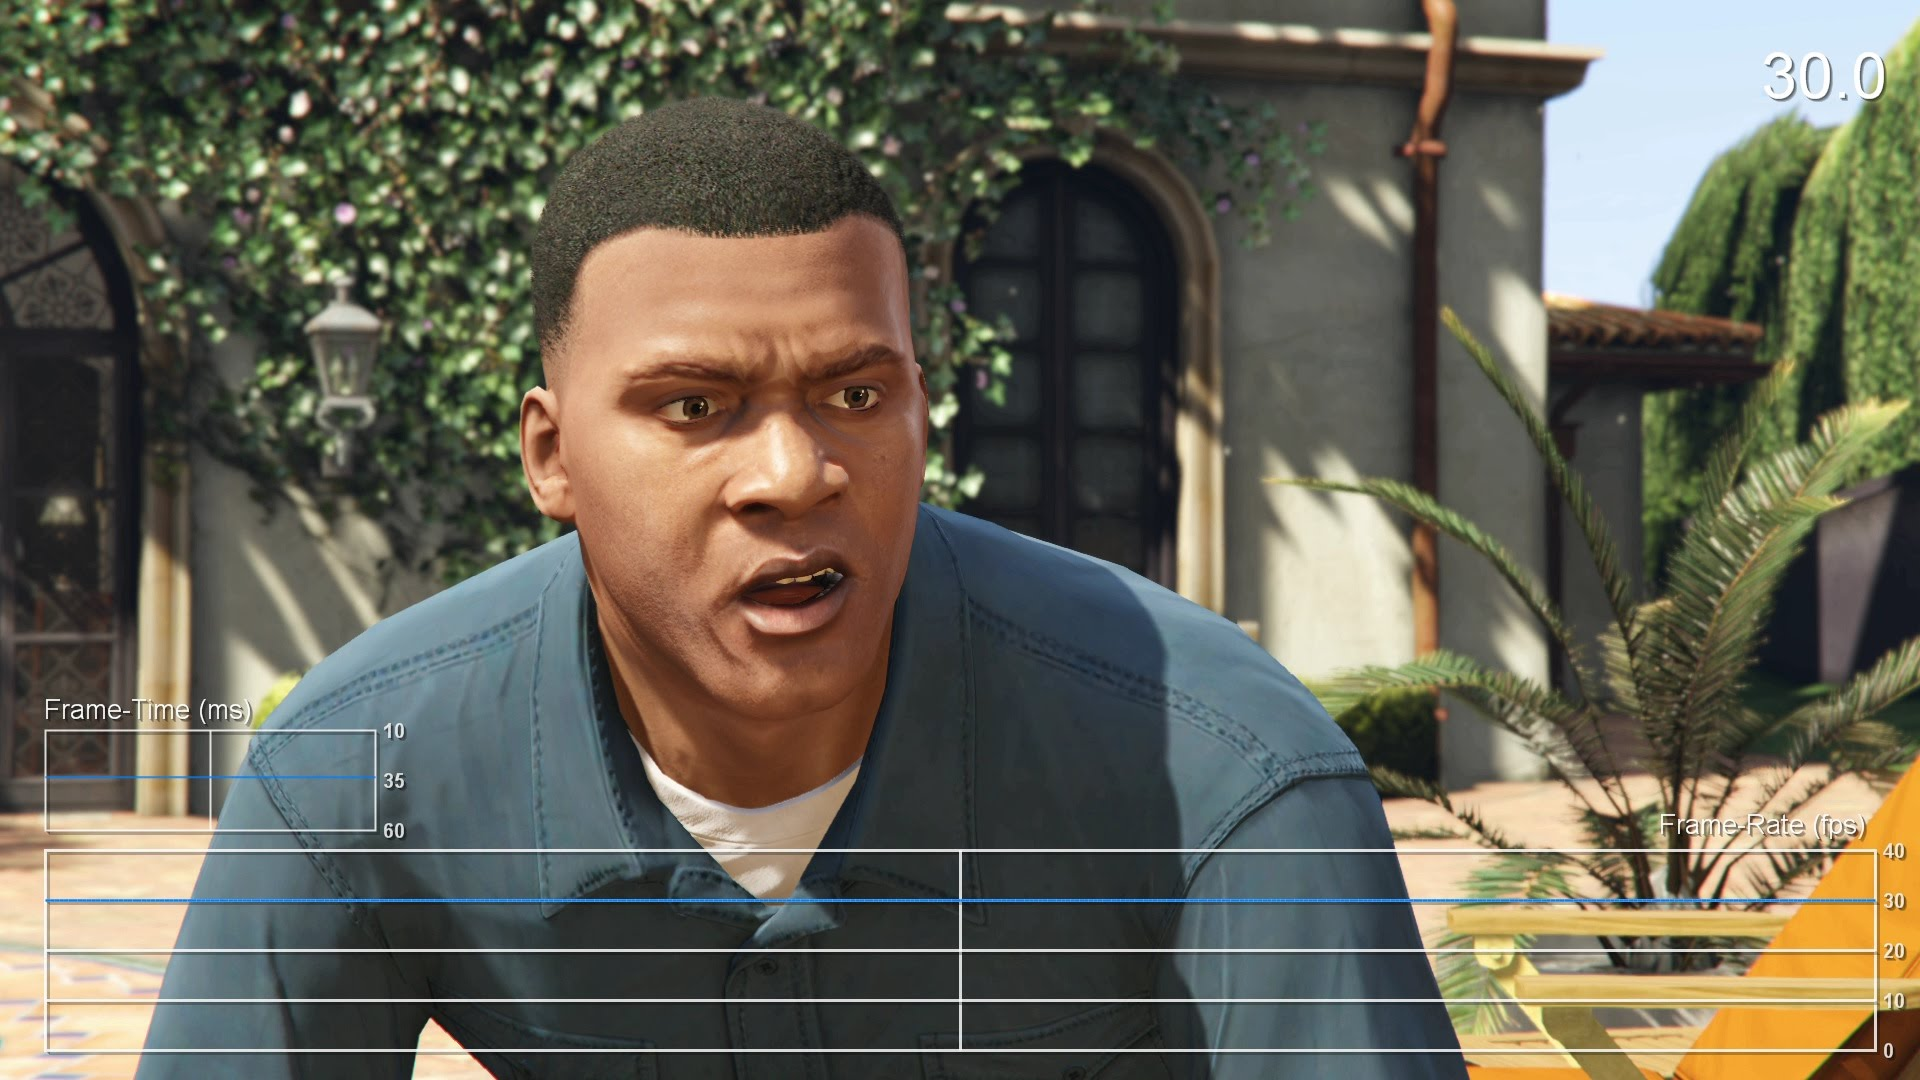 PS4/XB1『グランド・セフト・オートV』両ハード共に抜群の安定感を見せるフレームレートテスト映像